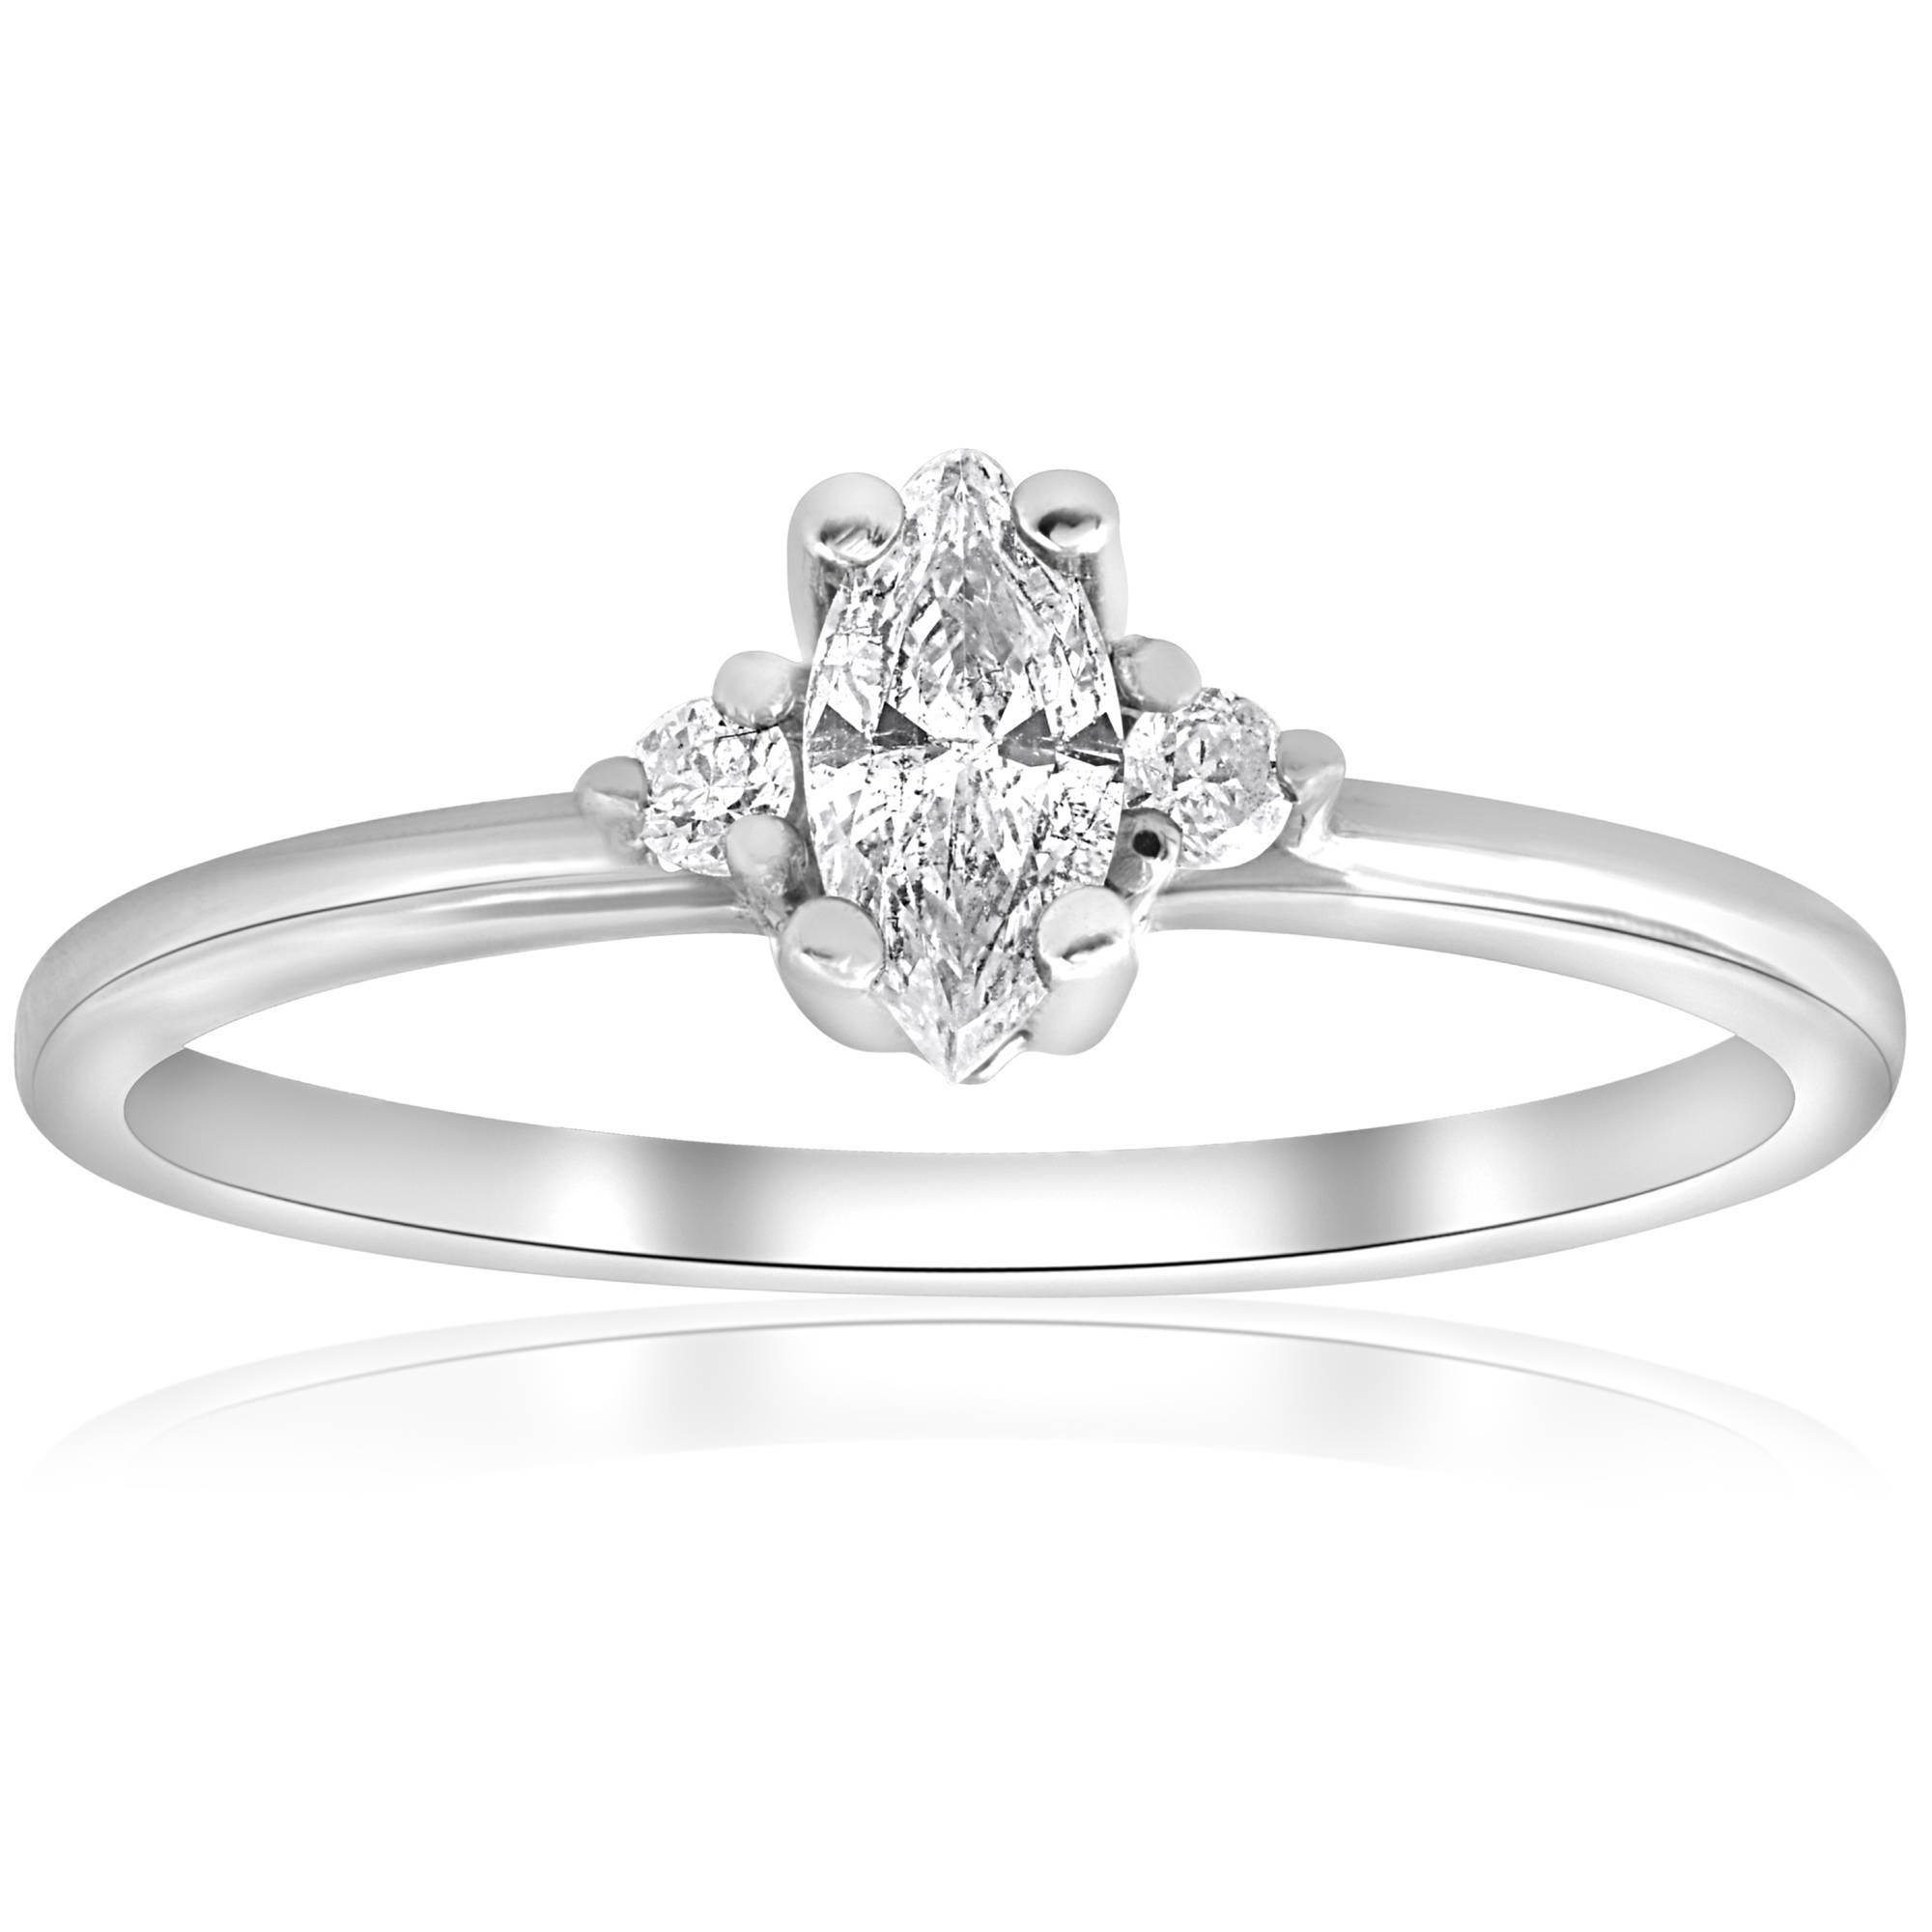 Marquise Diamond Three Stone Engagement Ring 1/3 ct 10k